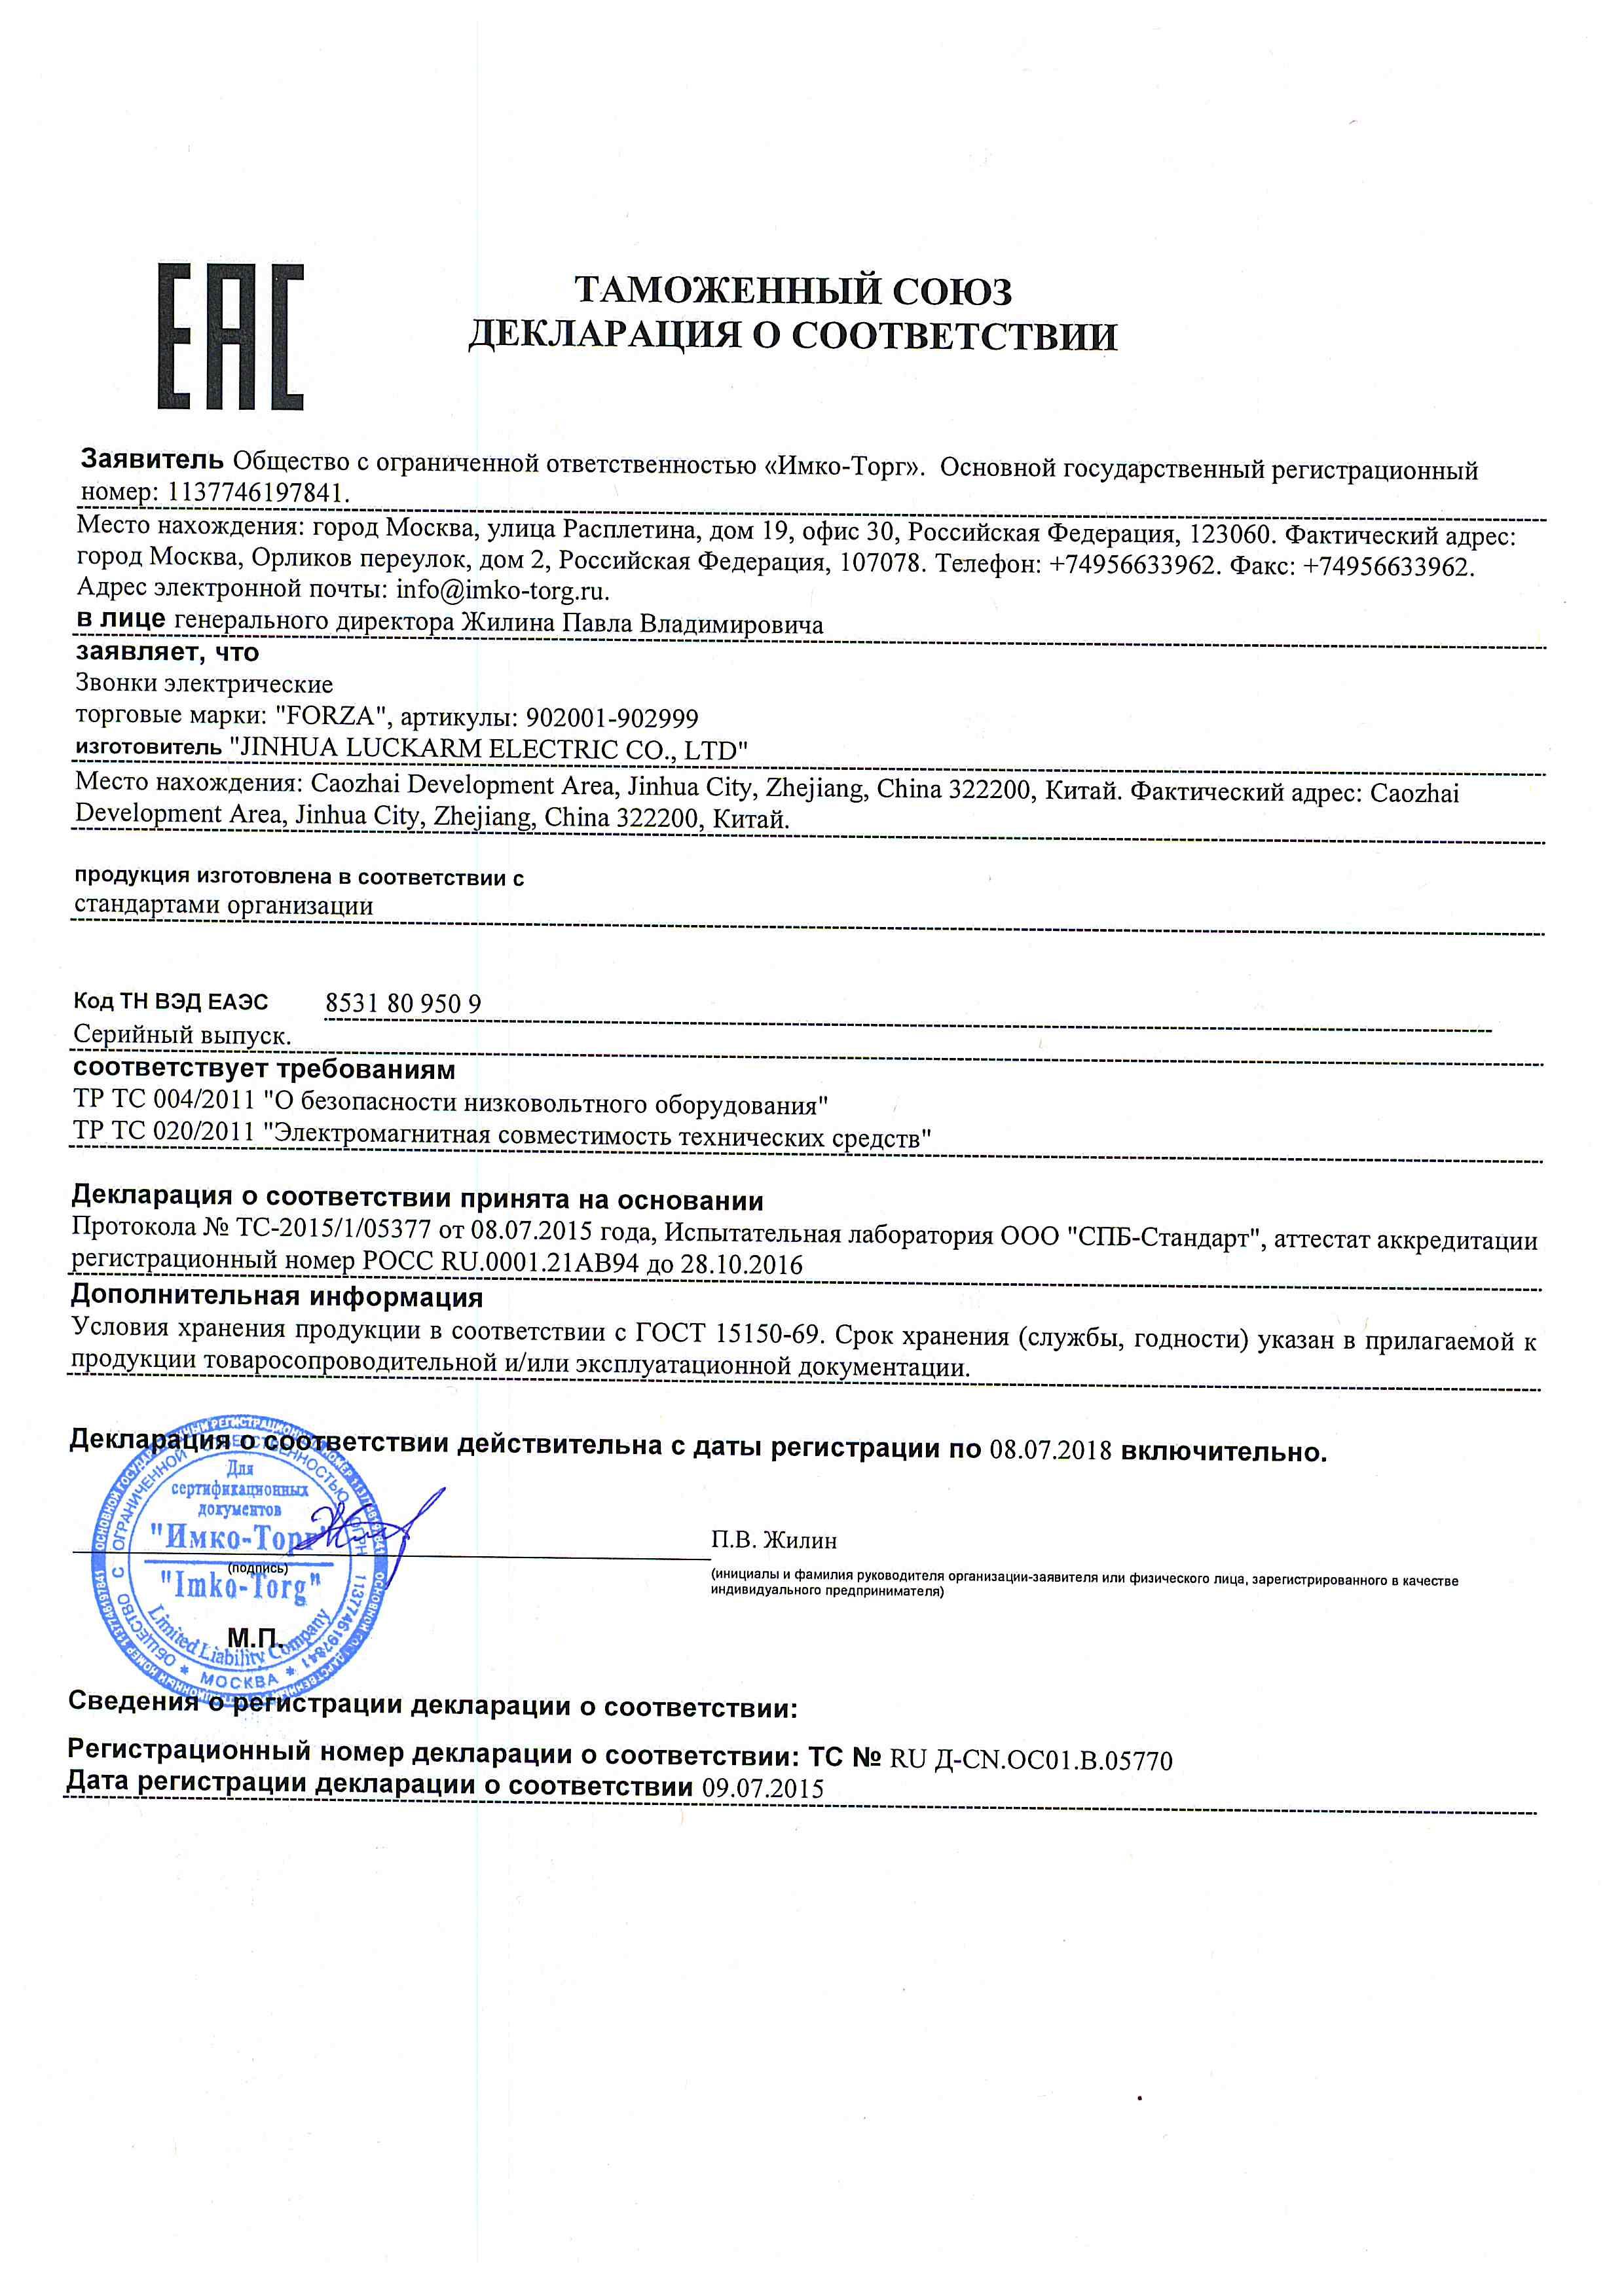 RUD-CN.OS01.V.05770.jpg